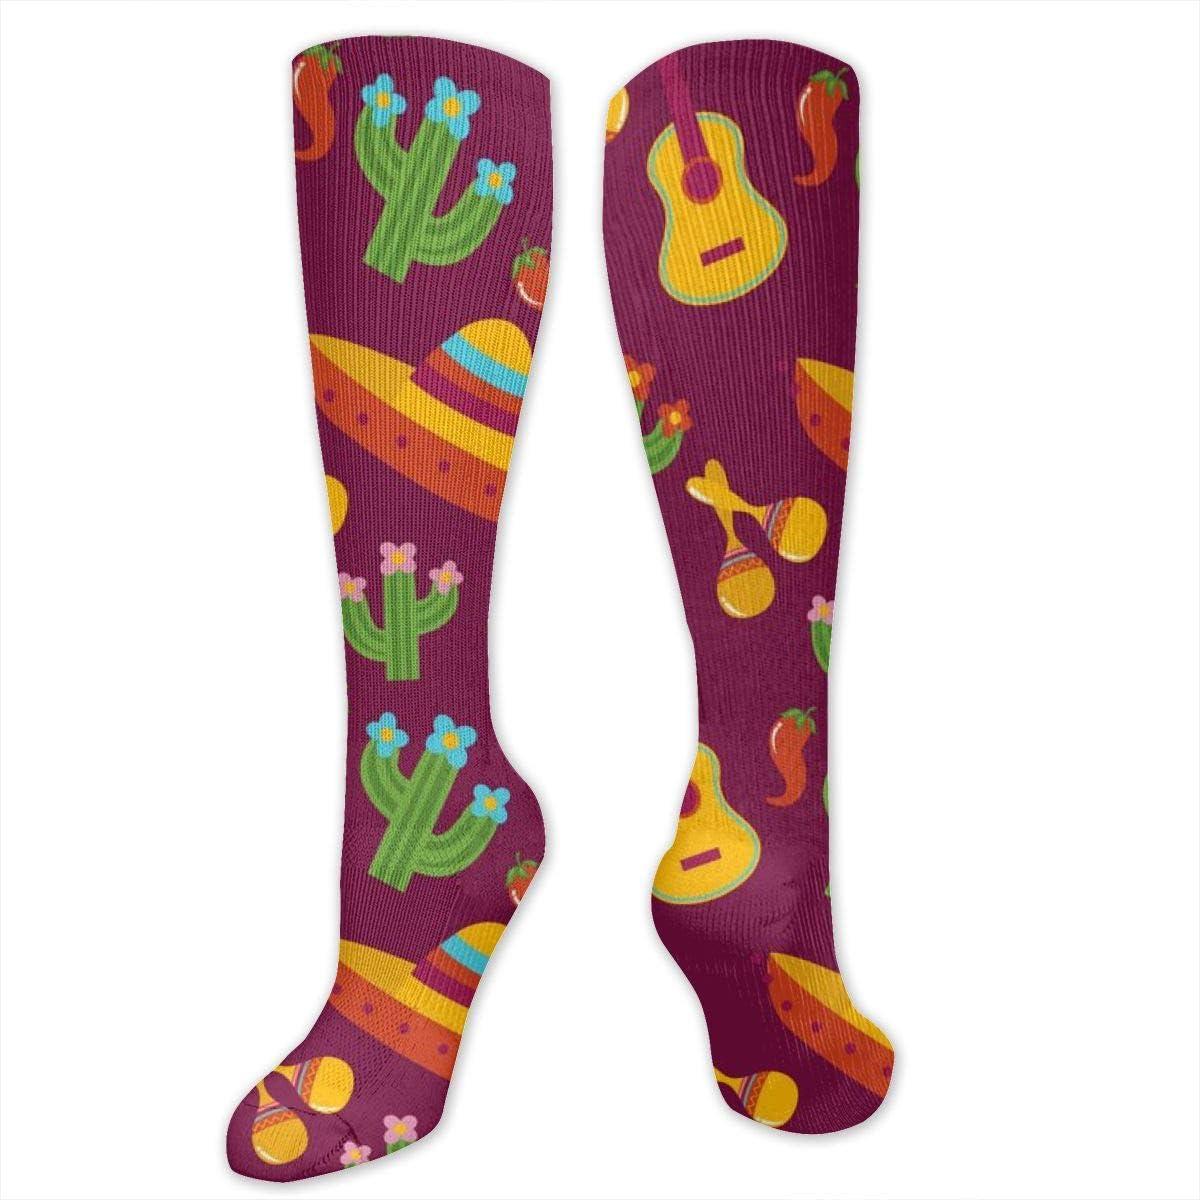 Chanwazibibiliu African Motifs Mens Colorful Dress Socks Funky Men Multicolored Pattern Fashionable Fun Crew Cotton Socks